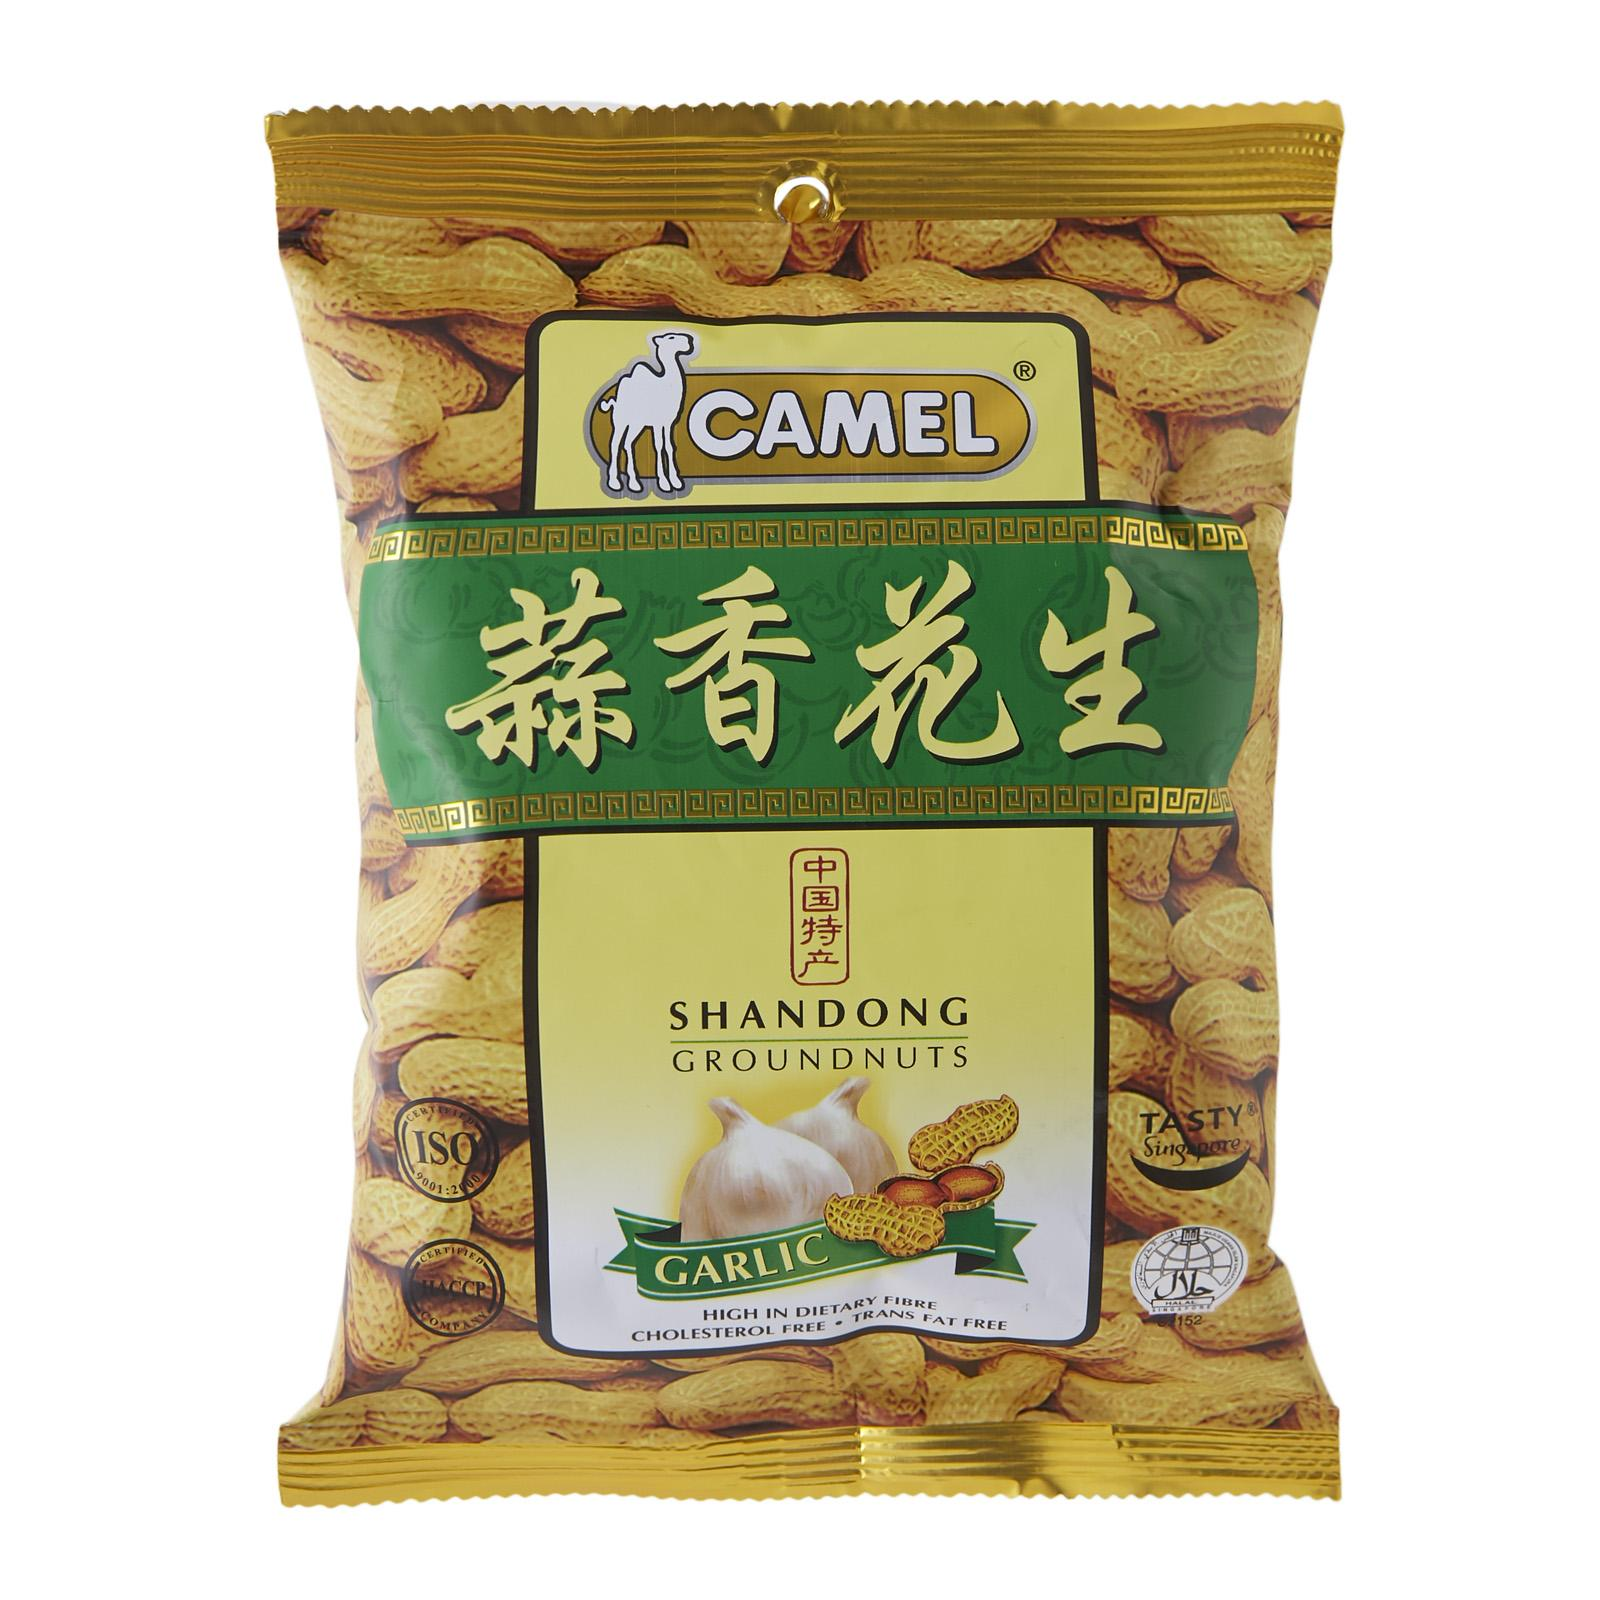 CAMEL Garlic Shandong Groundnuts 130g